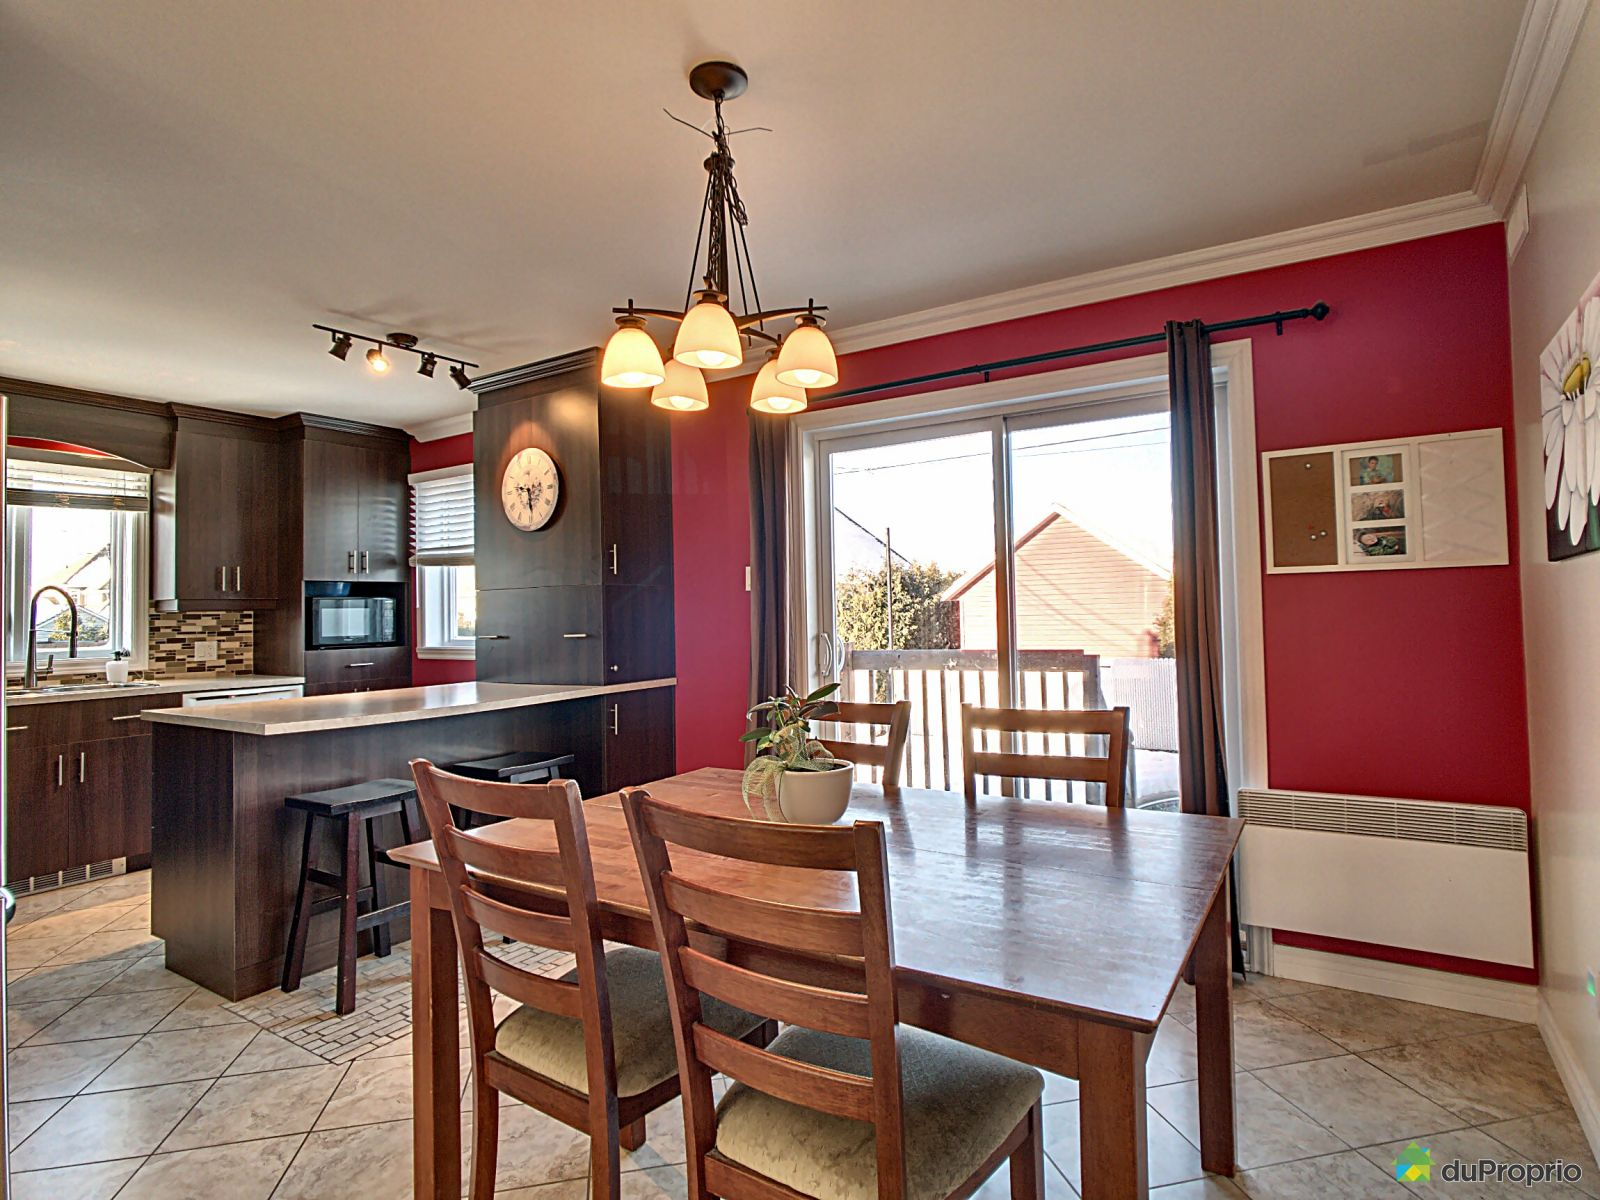 Dining Room - 17340 rue Comeau, Bécancour (St-Gregoire) for sale